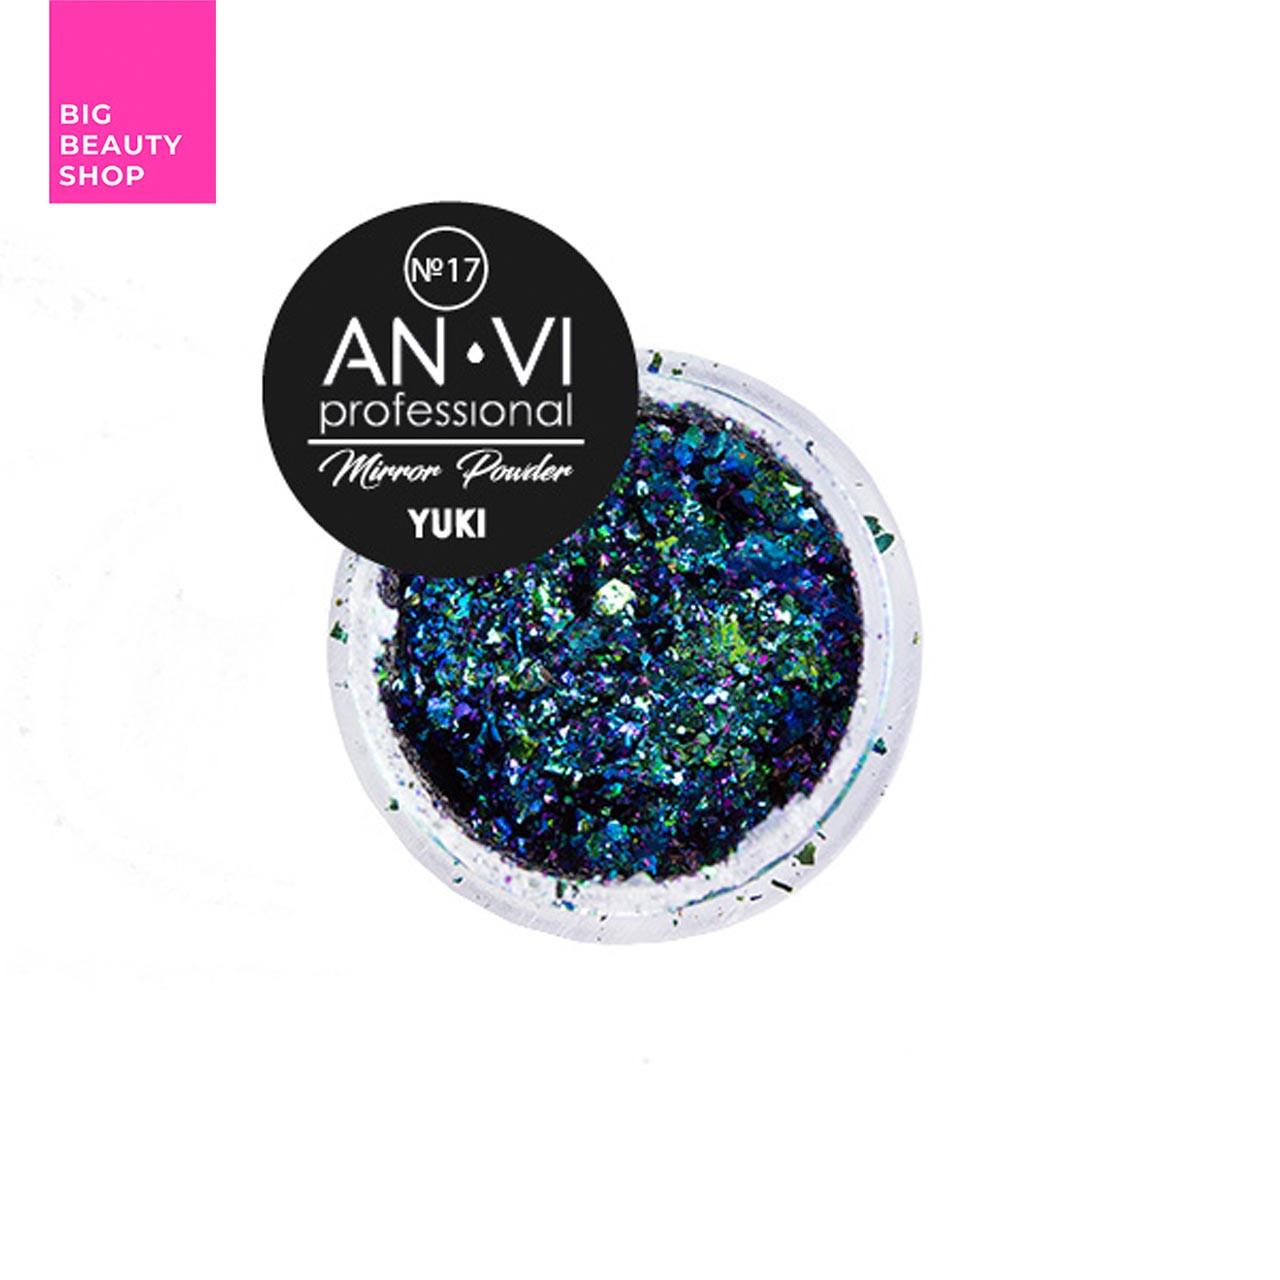 "Зеркальная пудра YUKI №17 ""Malachite Affection"" 1.2 г. ANVI Professional"